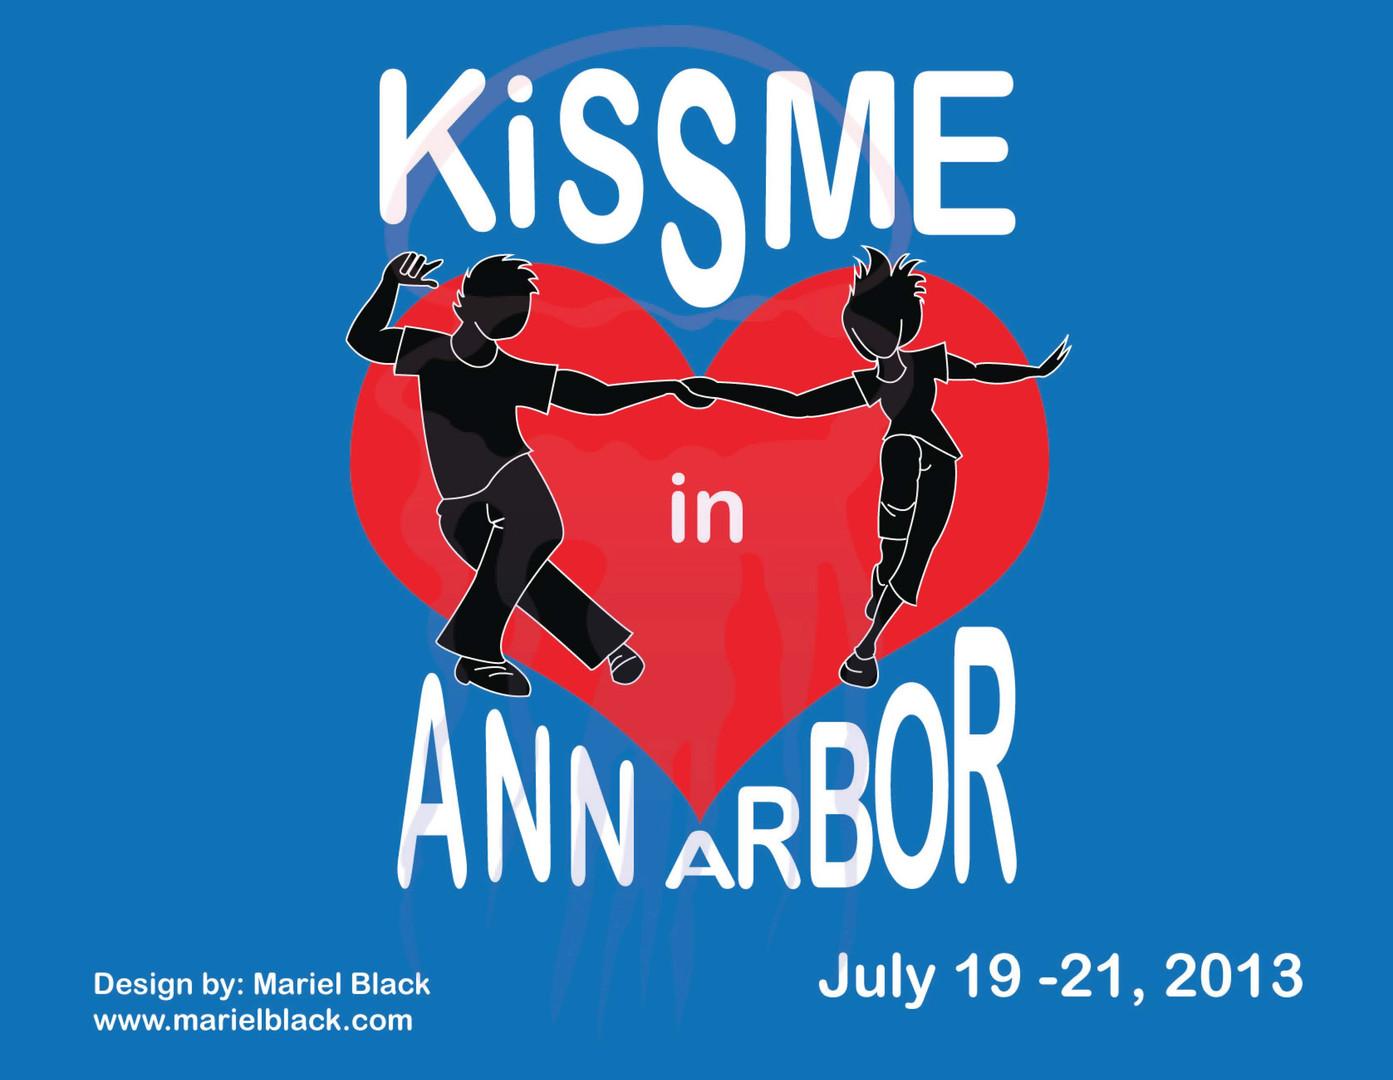 KissME in Ann Arbor Postcard design front Year 5 - 2013